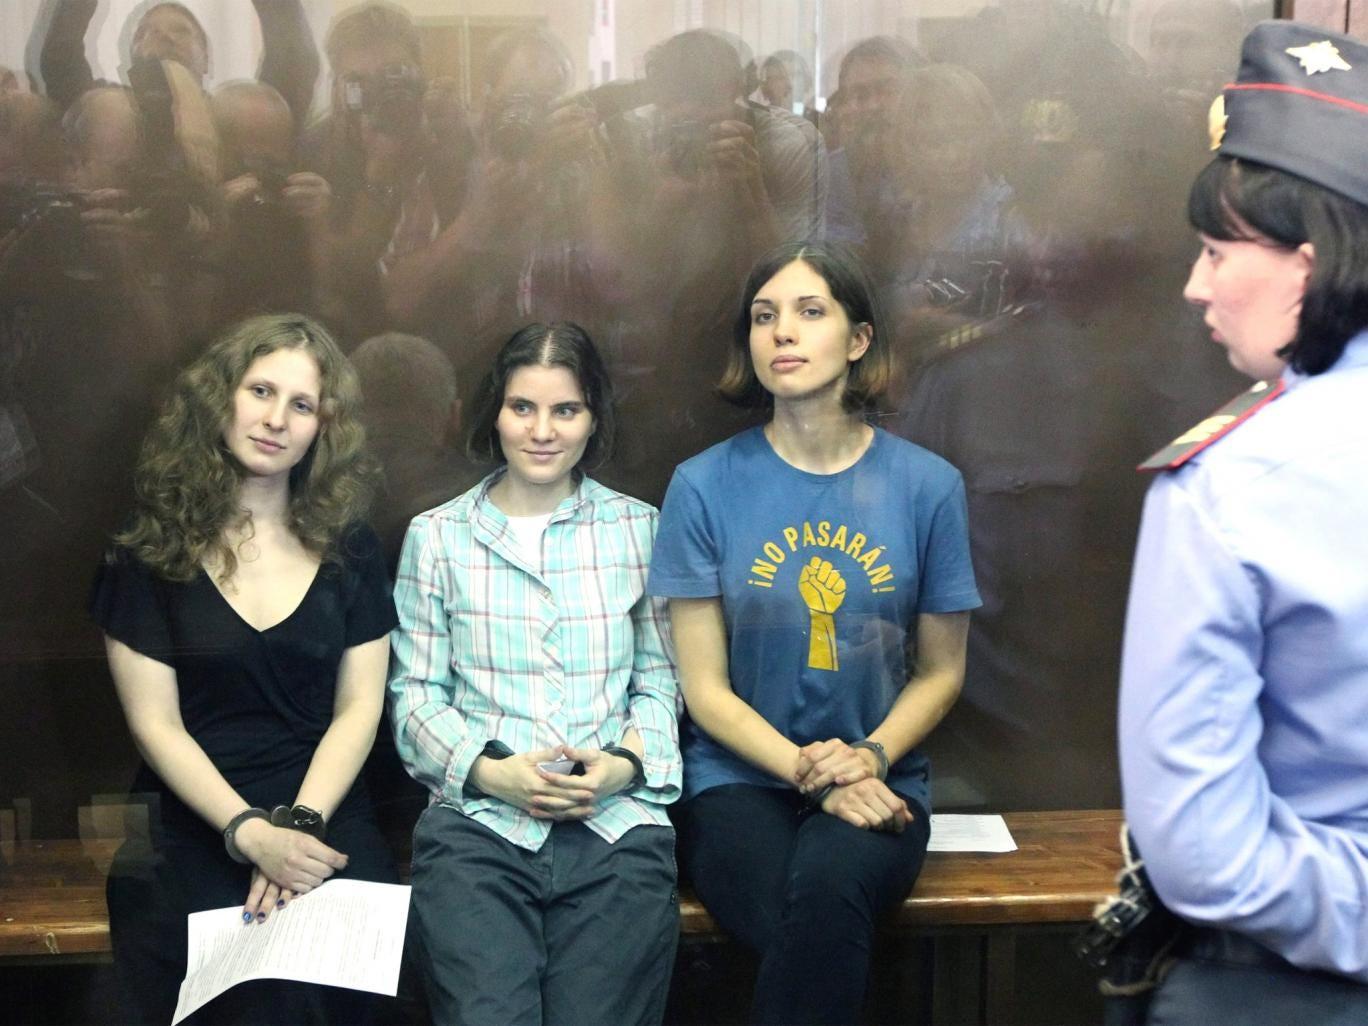 Maria Alekhina, Ekaterina Samutsevich and Nadezhda Tolokonnikova in court in 2012